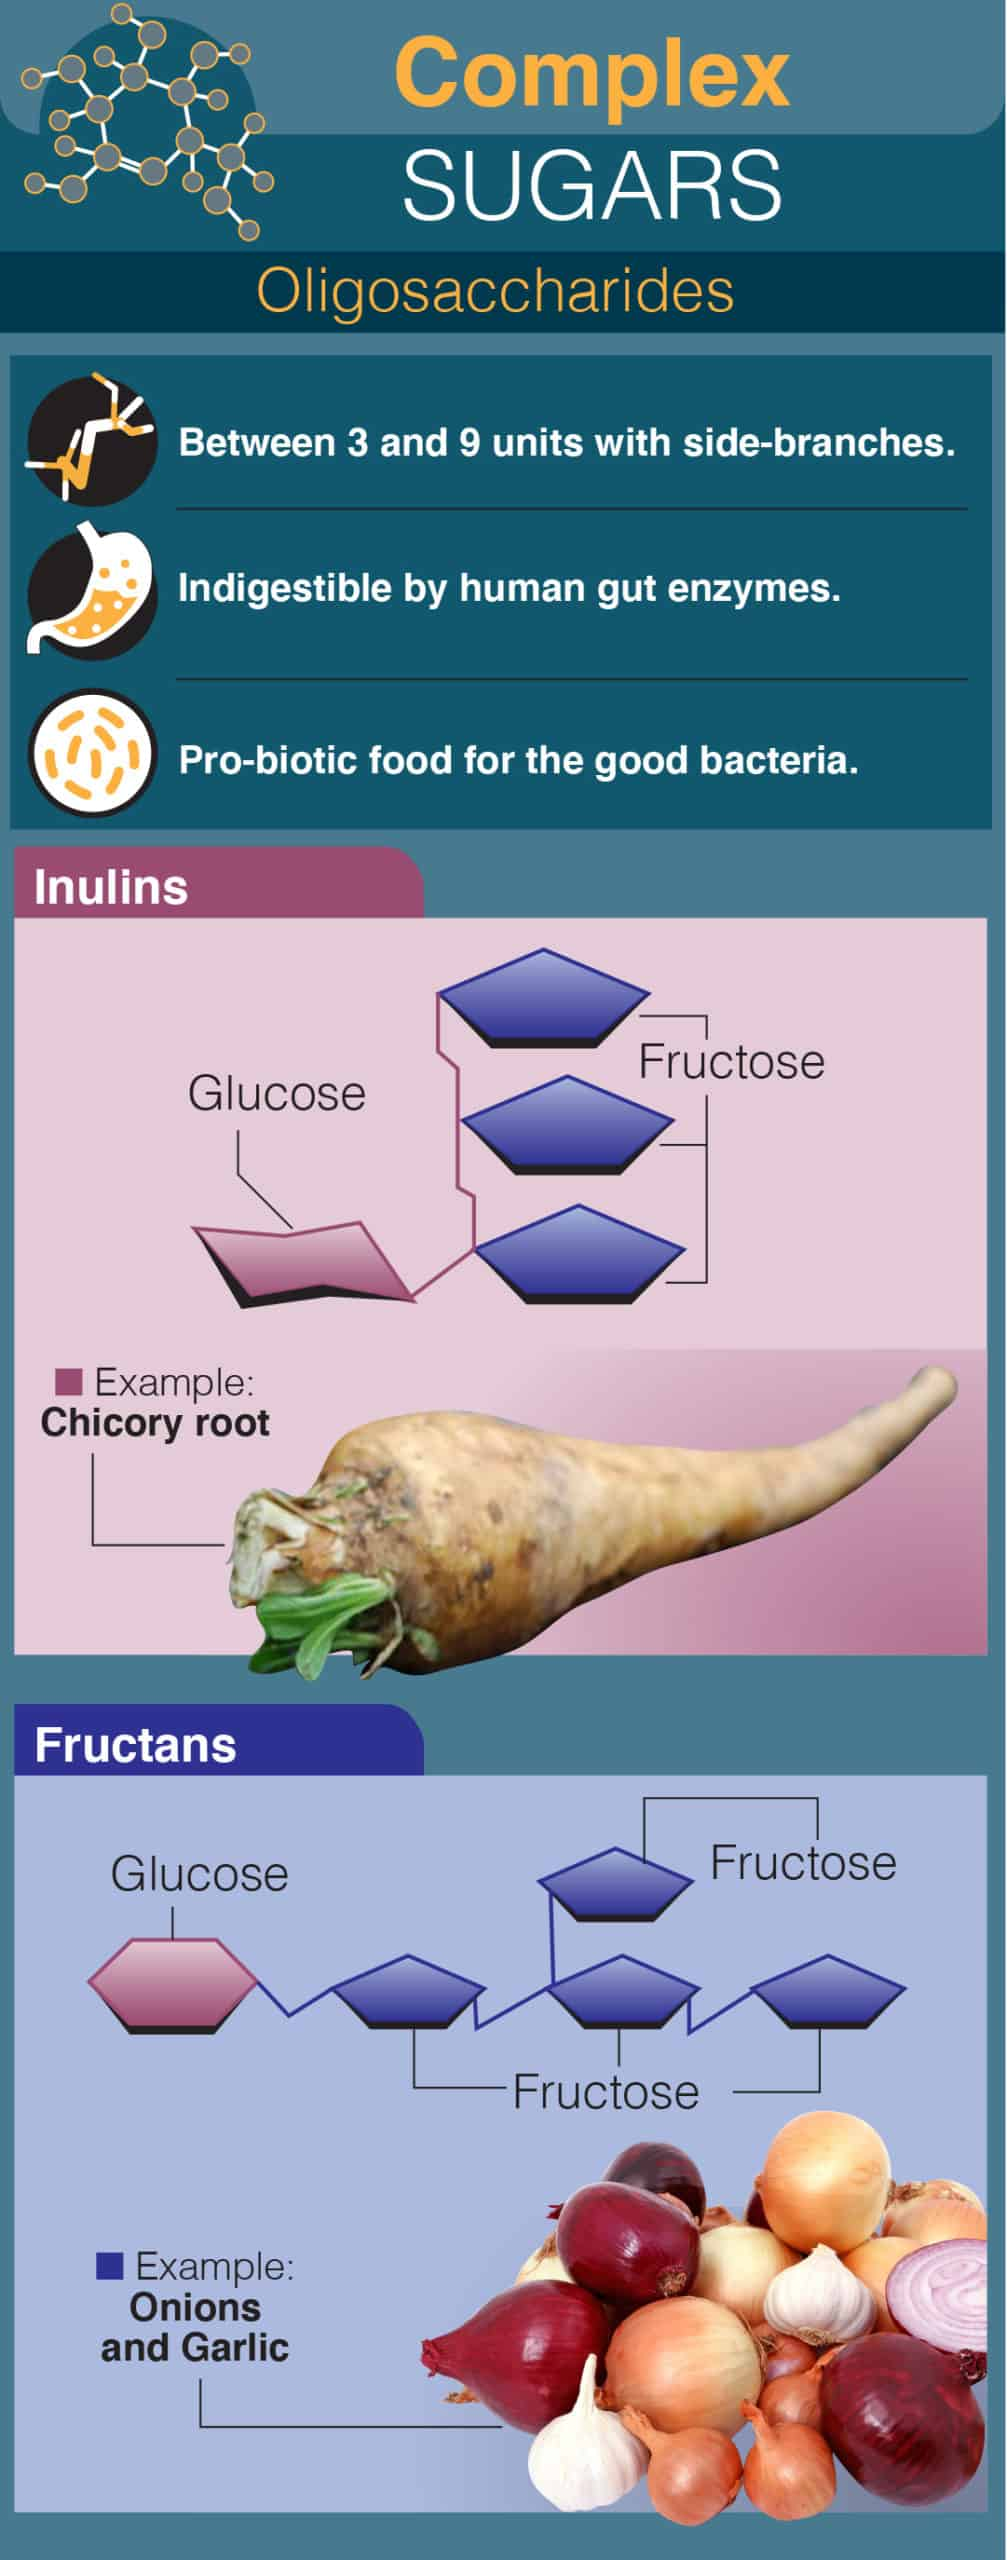 Complex Sugars: Oligosaccharides